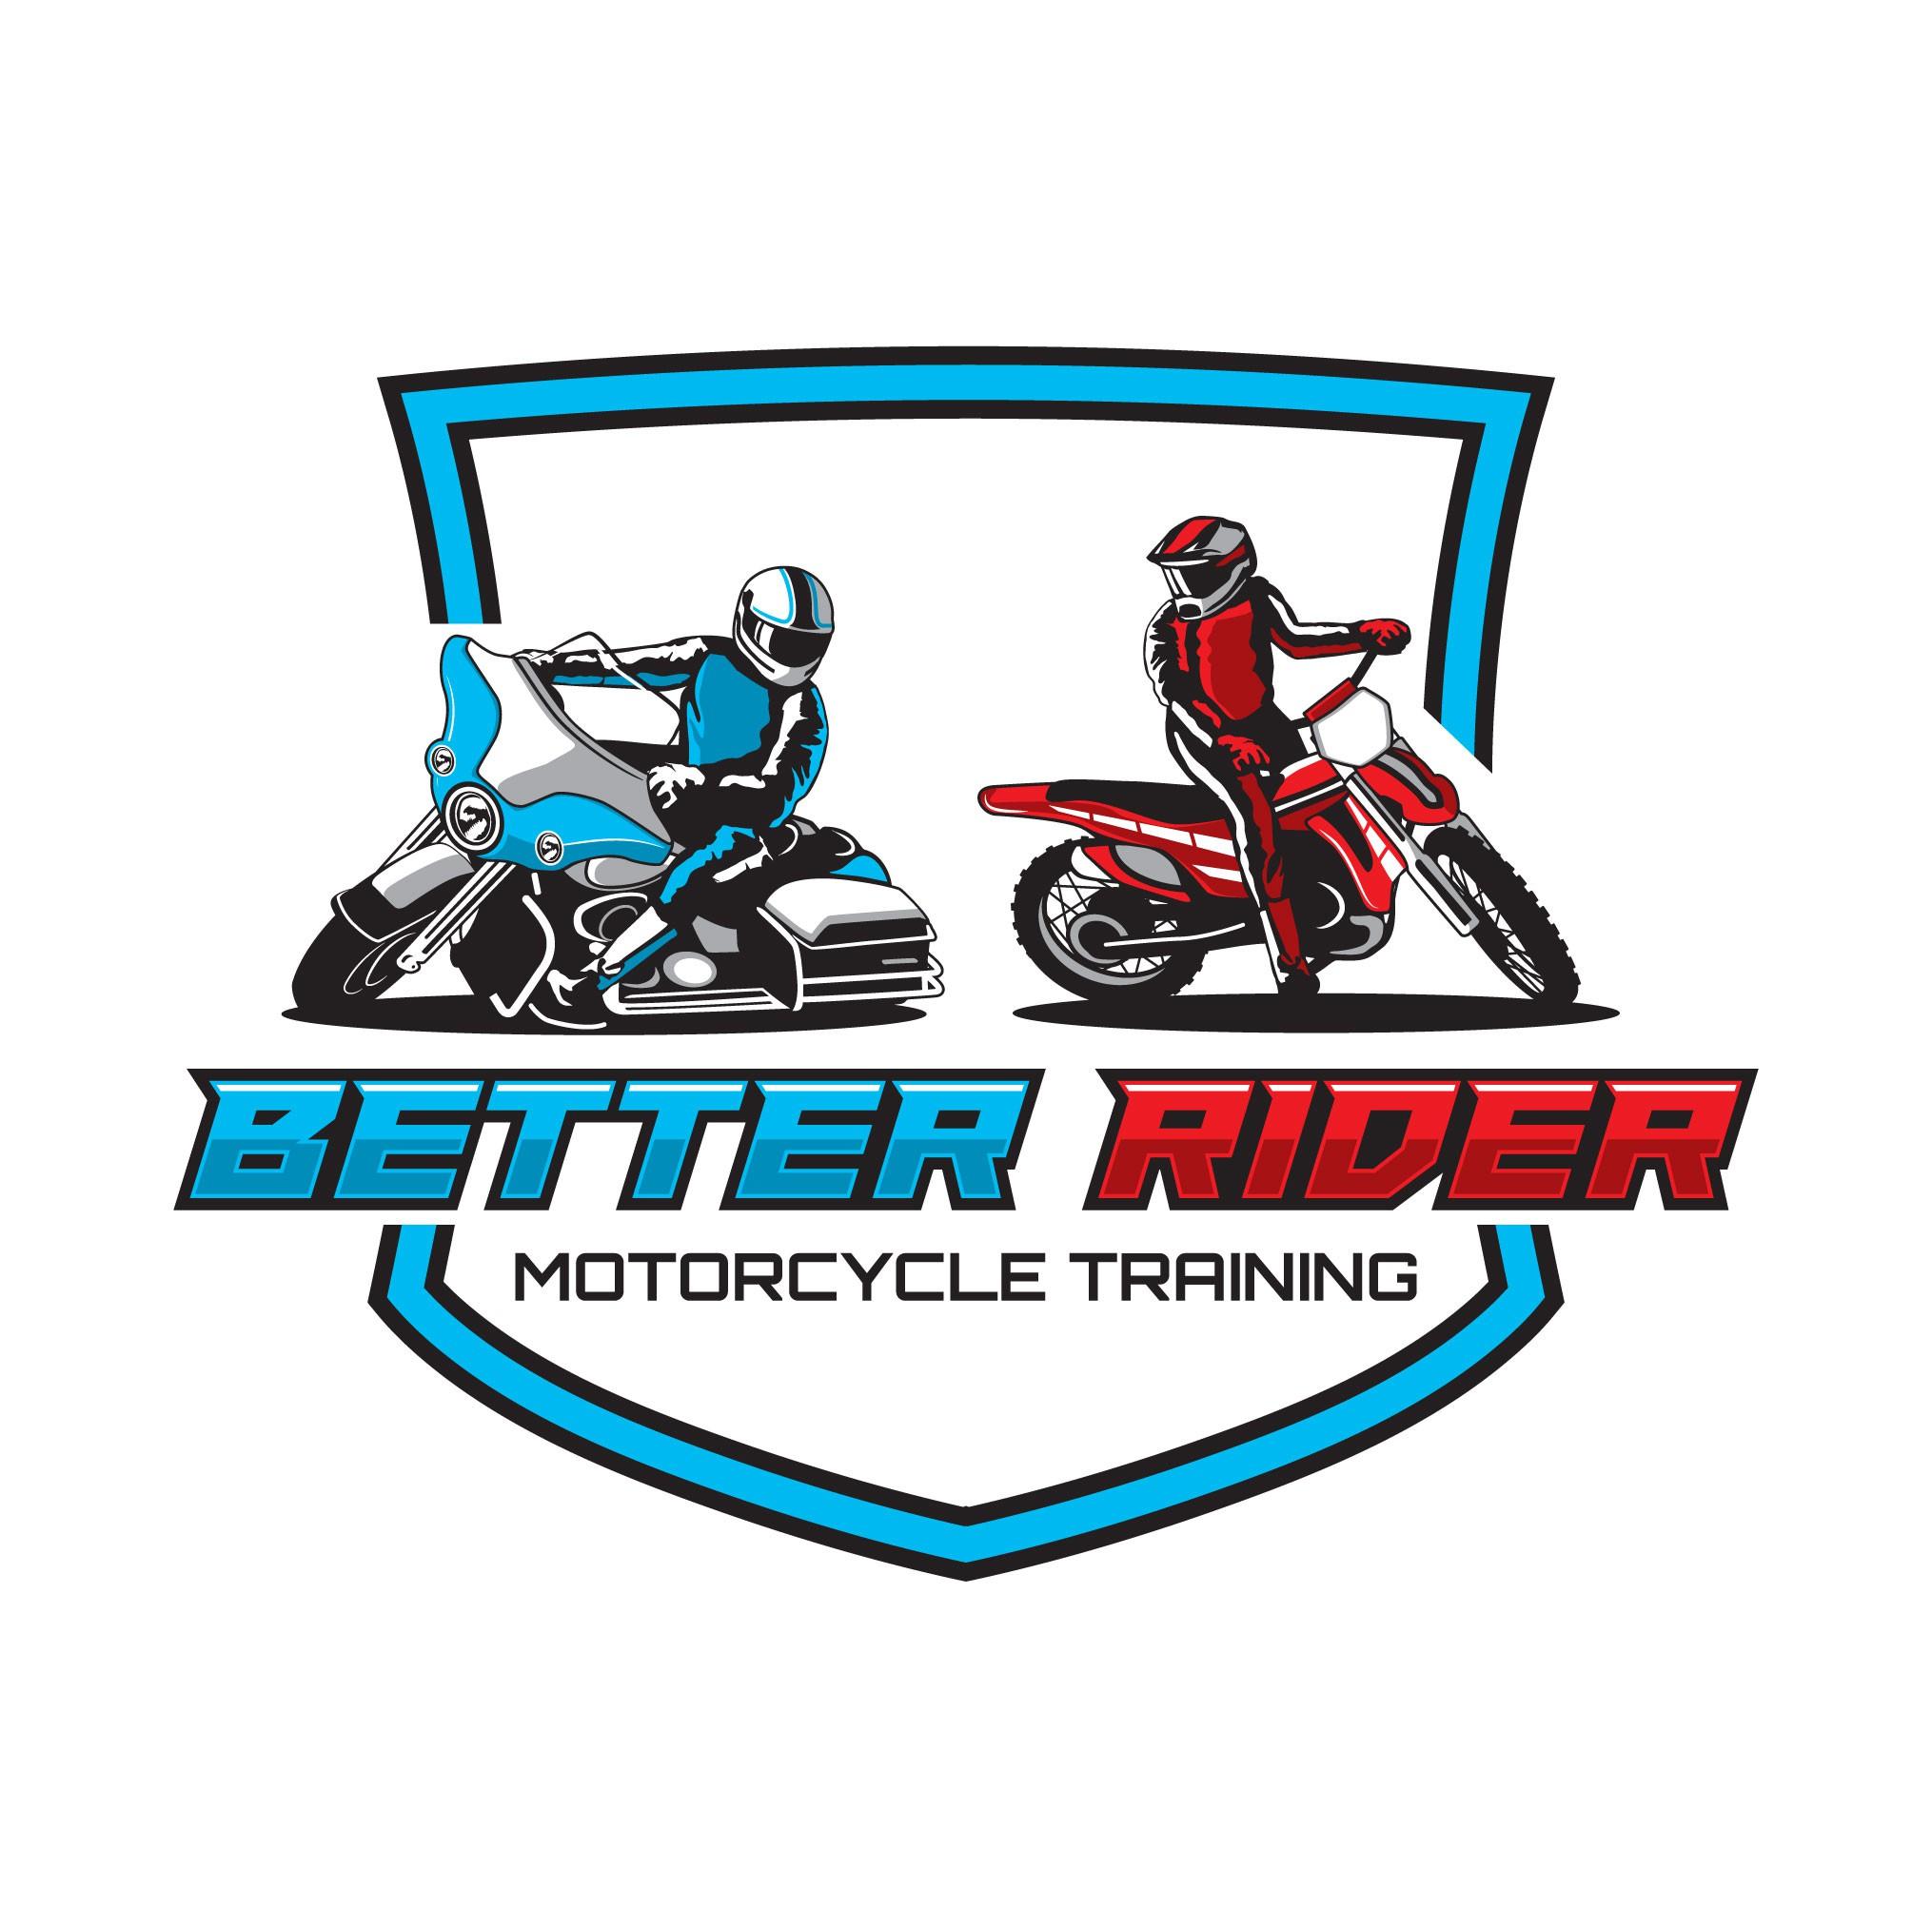 Motorcycle training company needs logo